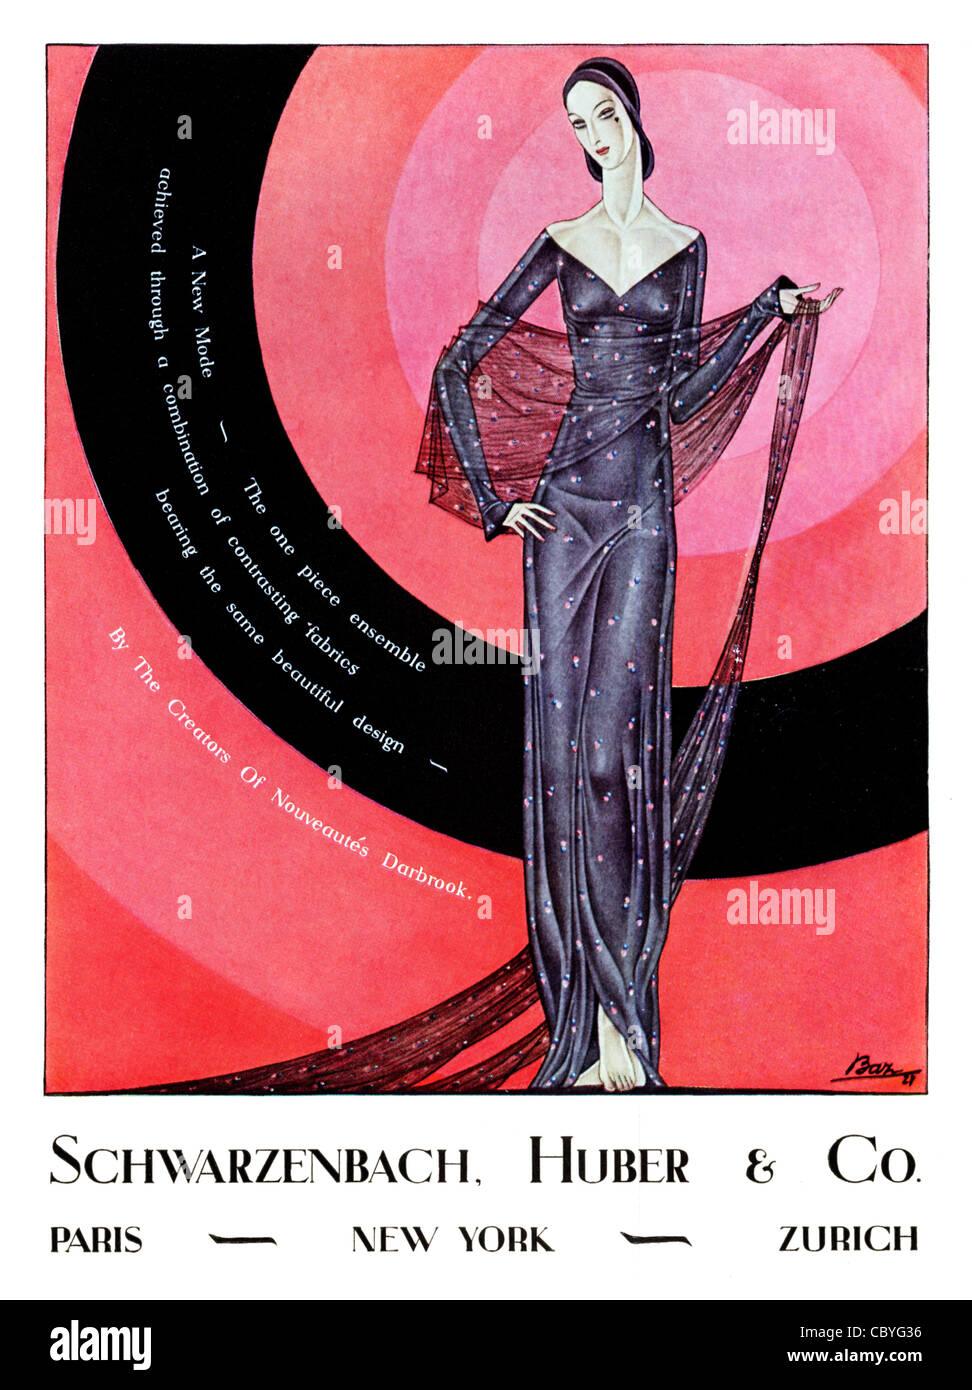 Vintage Fashion Print Original American Antique Poster 1920s American Ad Cigar Smoker Gift Clothesbook 39 Fashion Print Art Deco Art